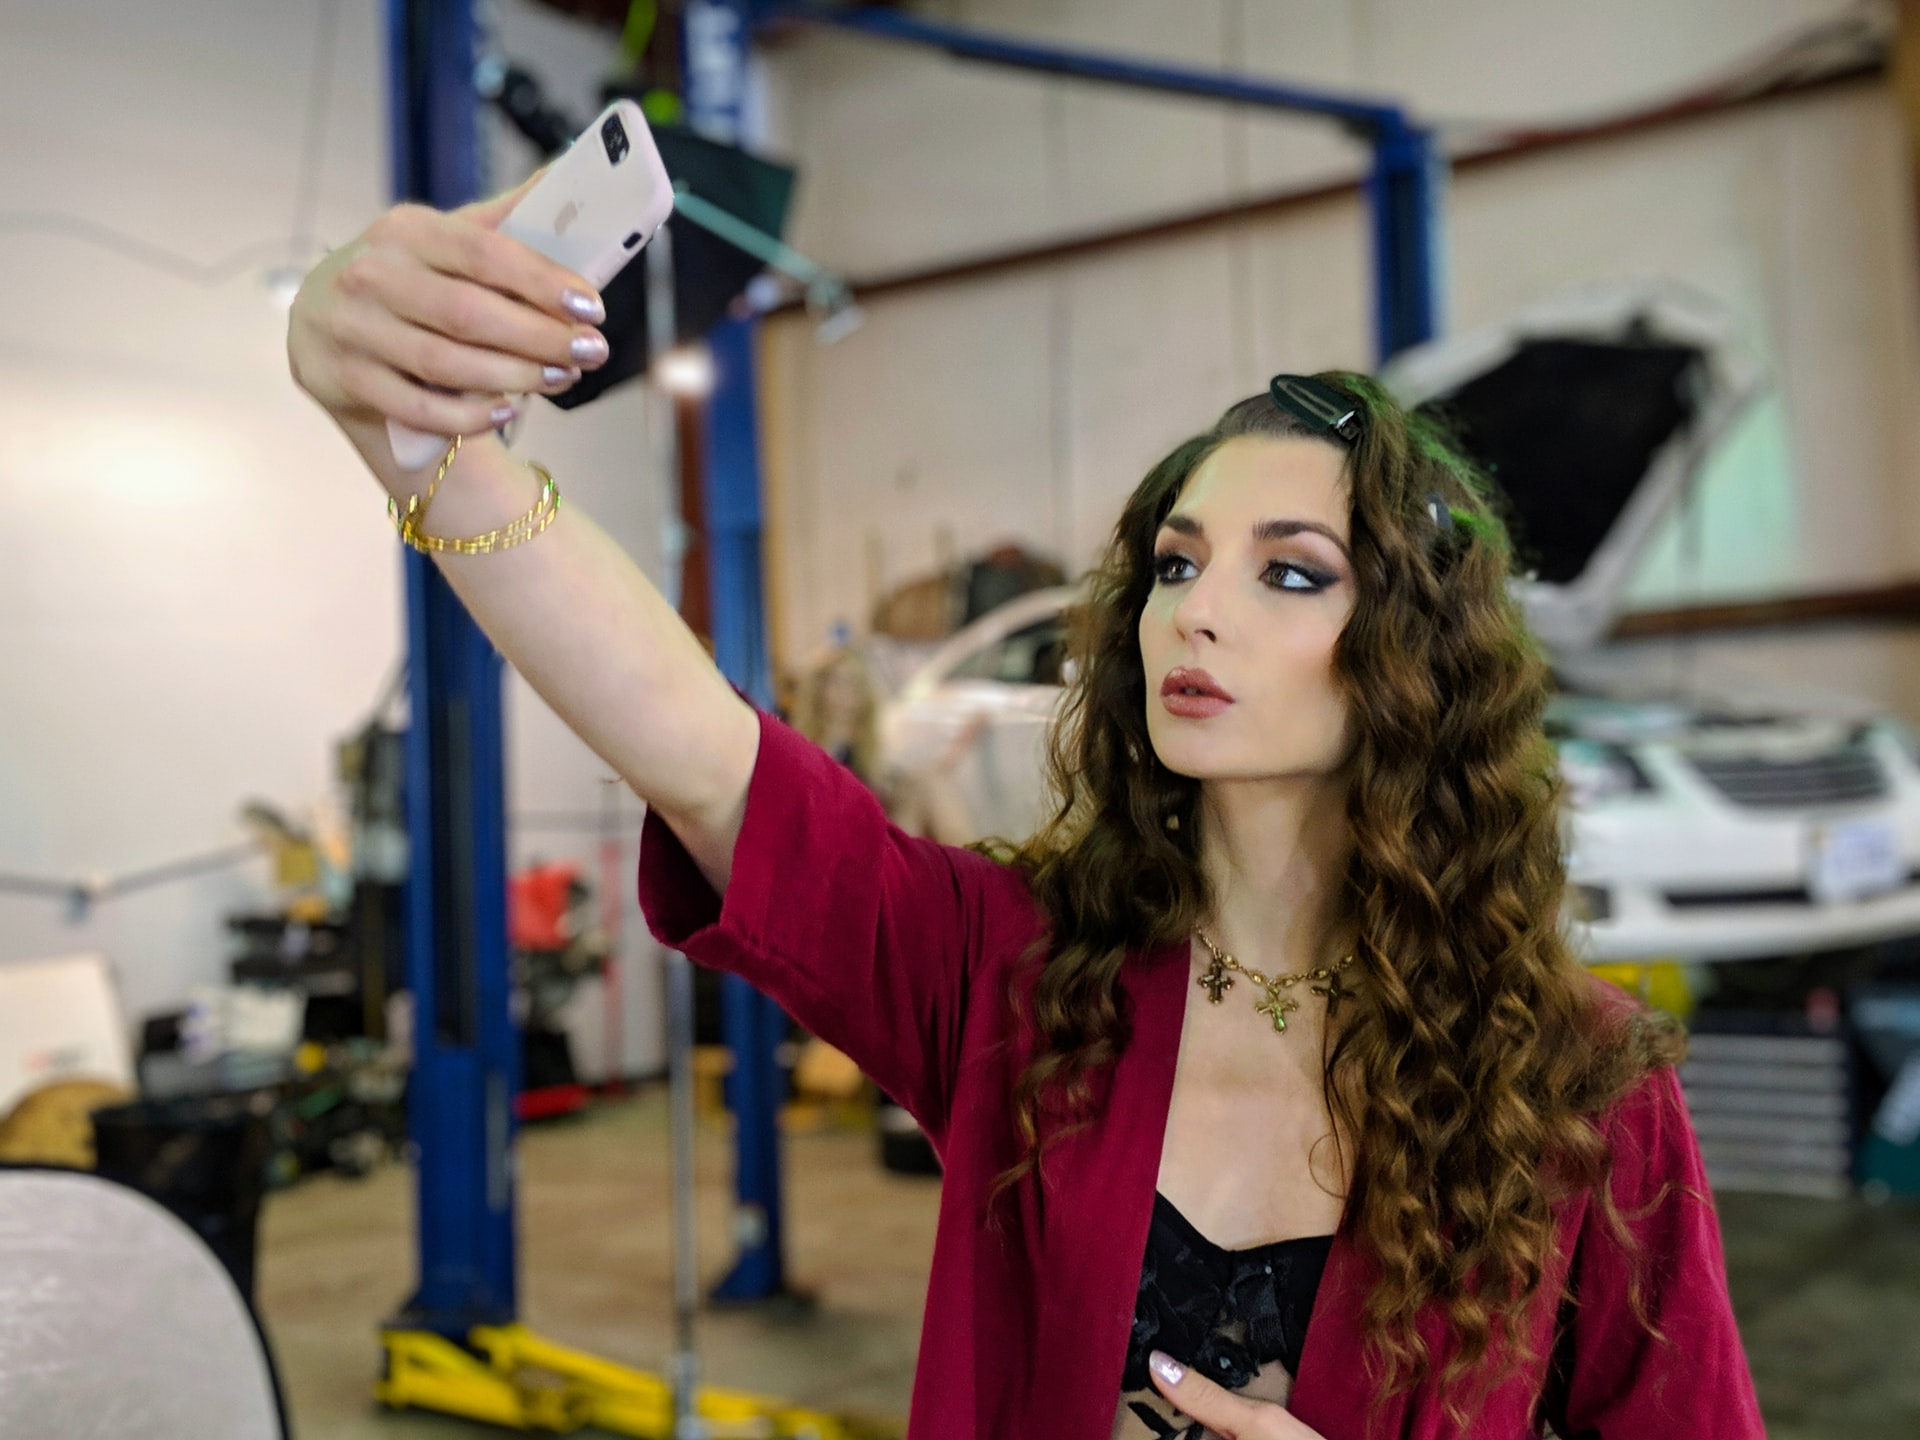 A beautiful, long-haired woman taking an Instagram selfie